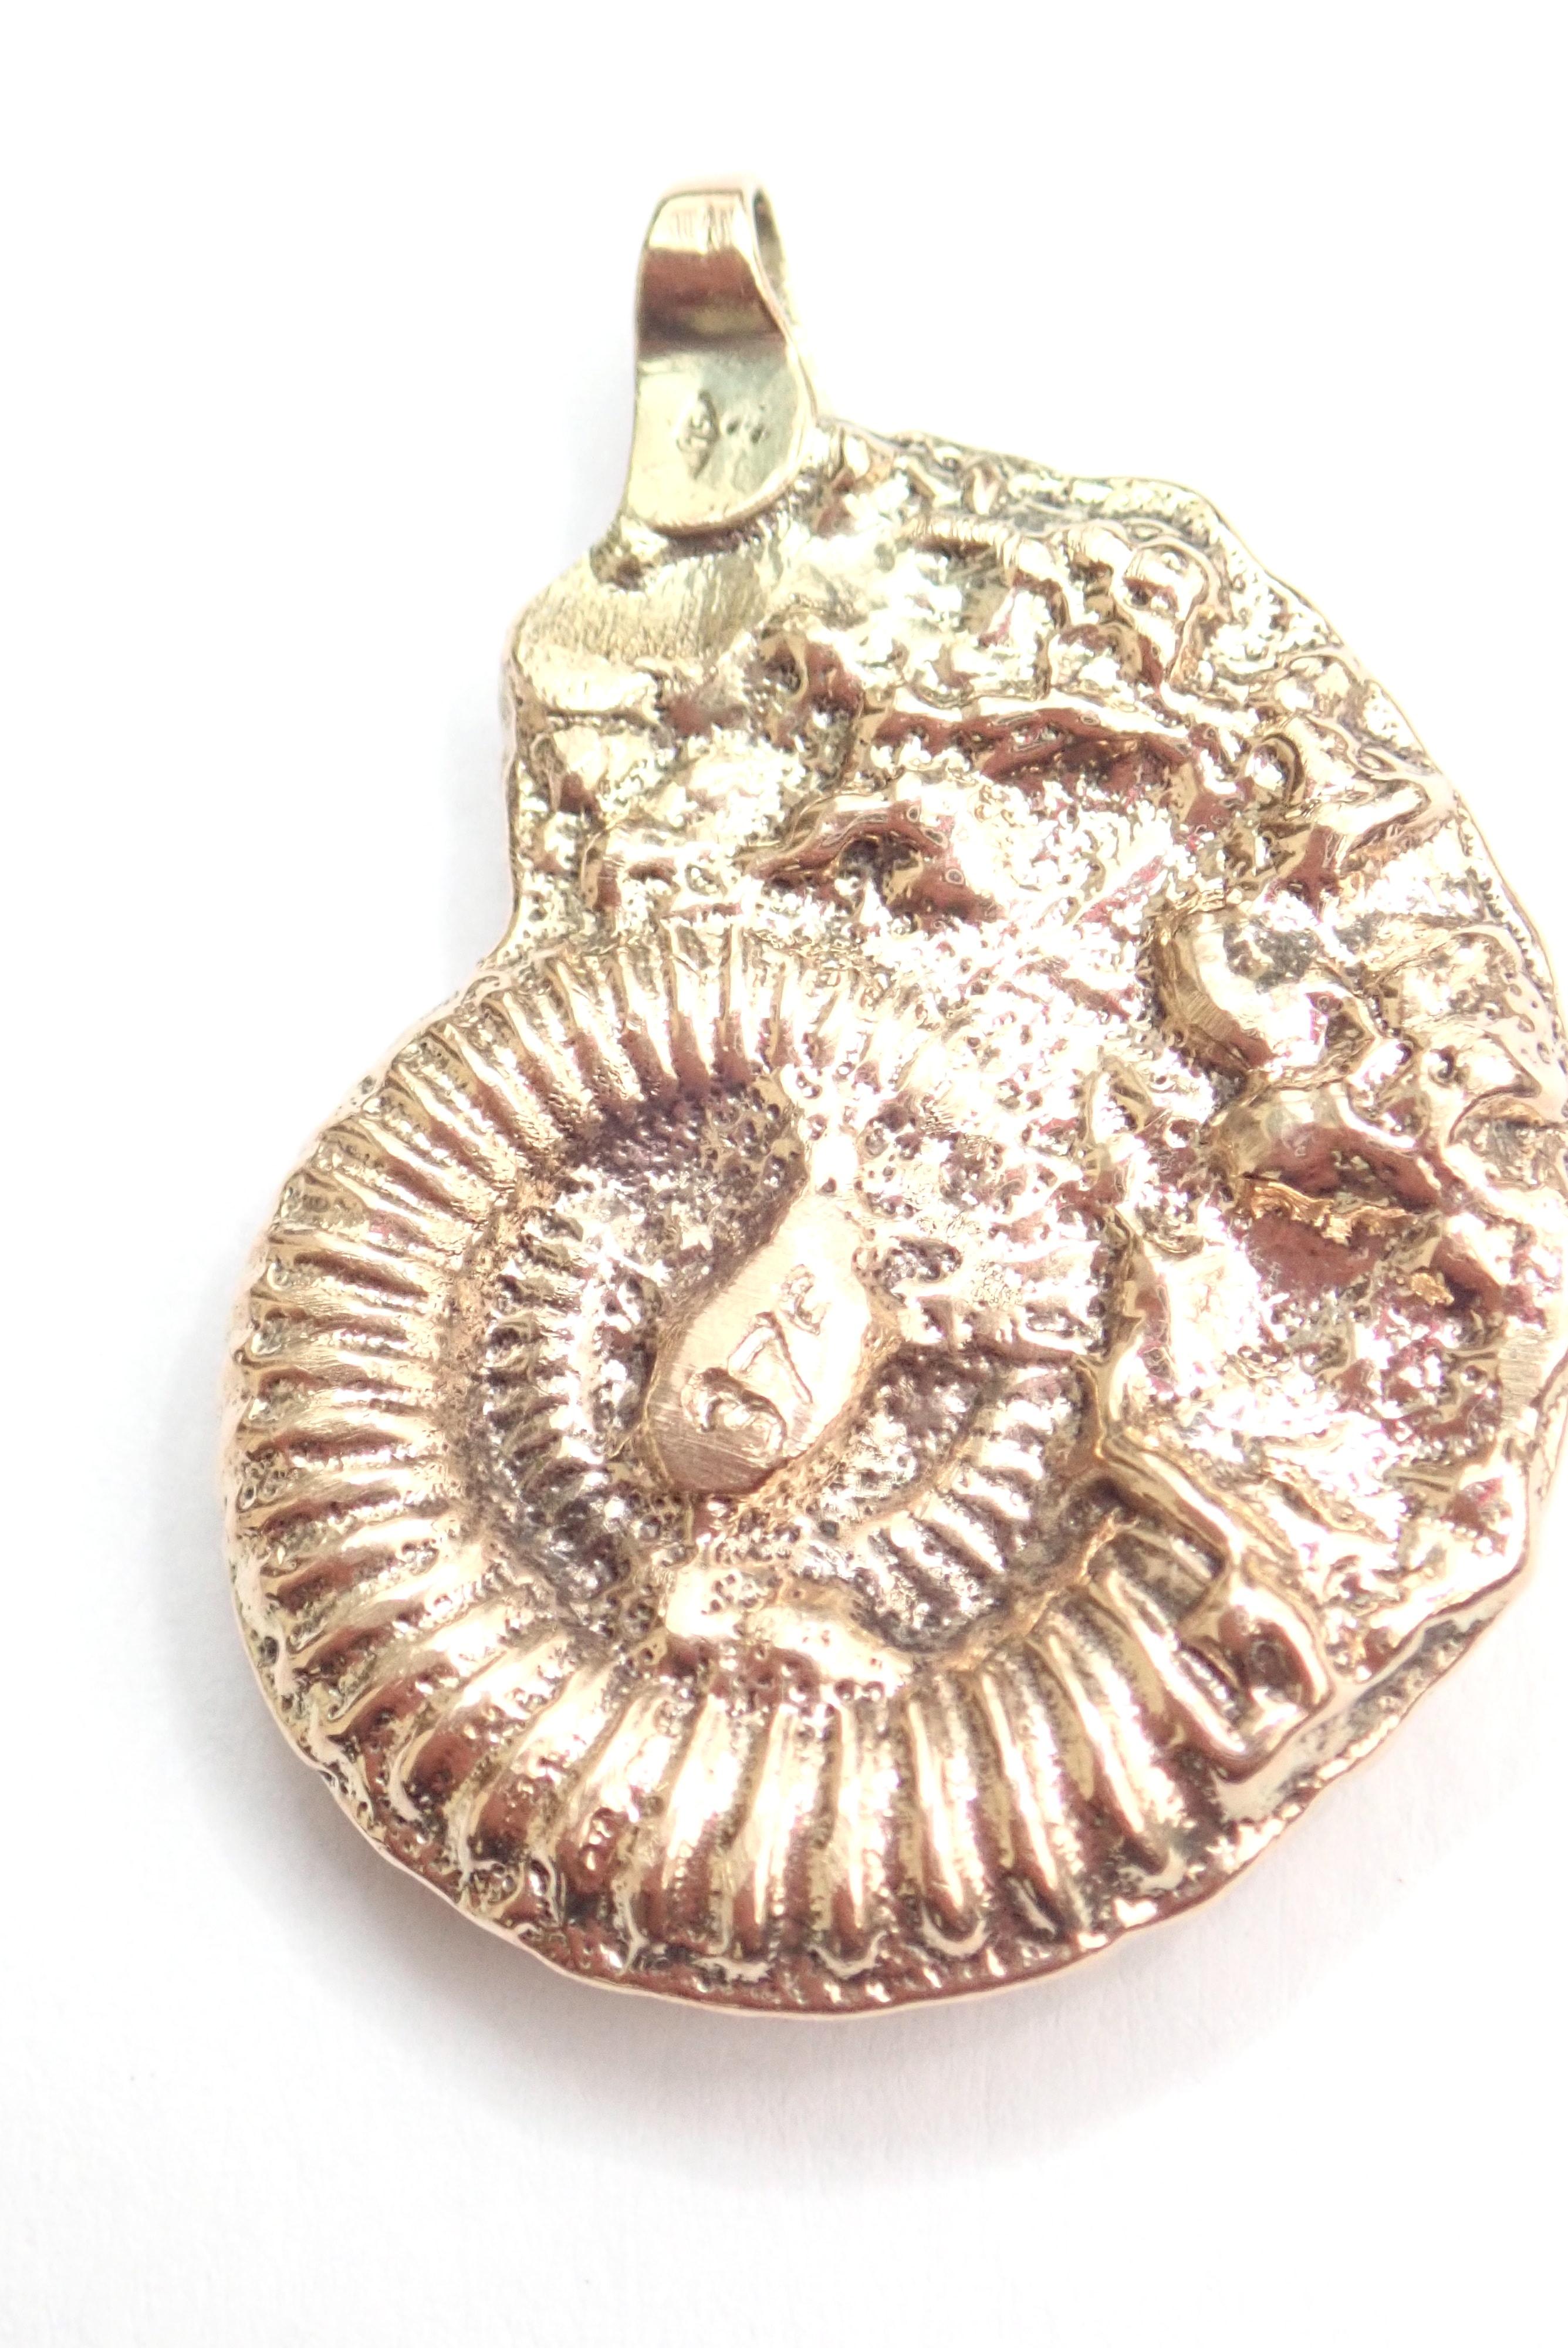 Solid 9ct Gold Handmade Ammonite Pendant 14.5gms